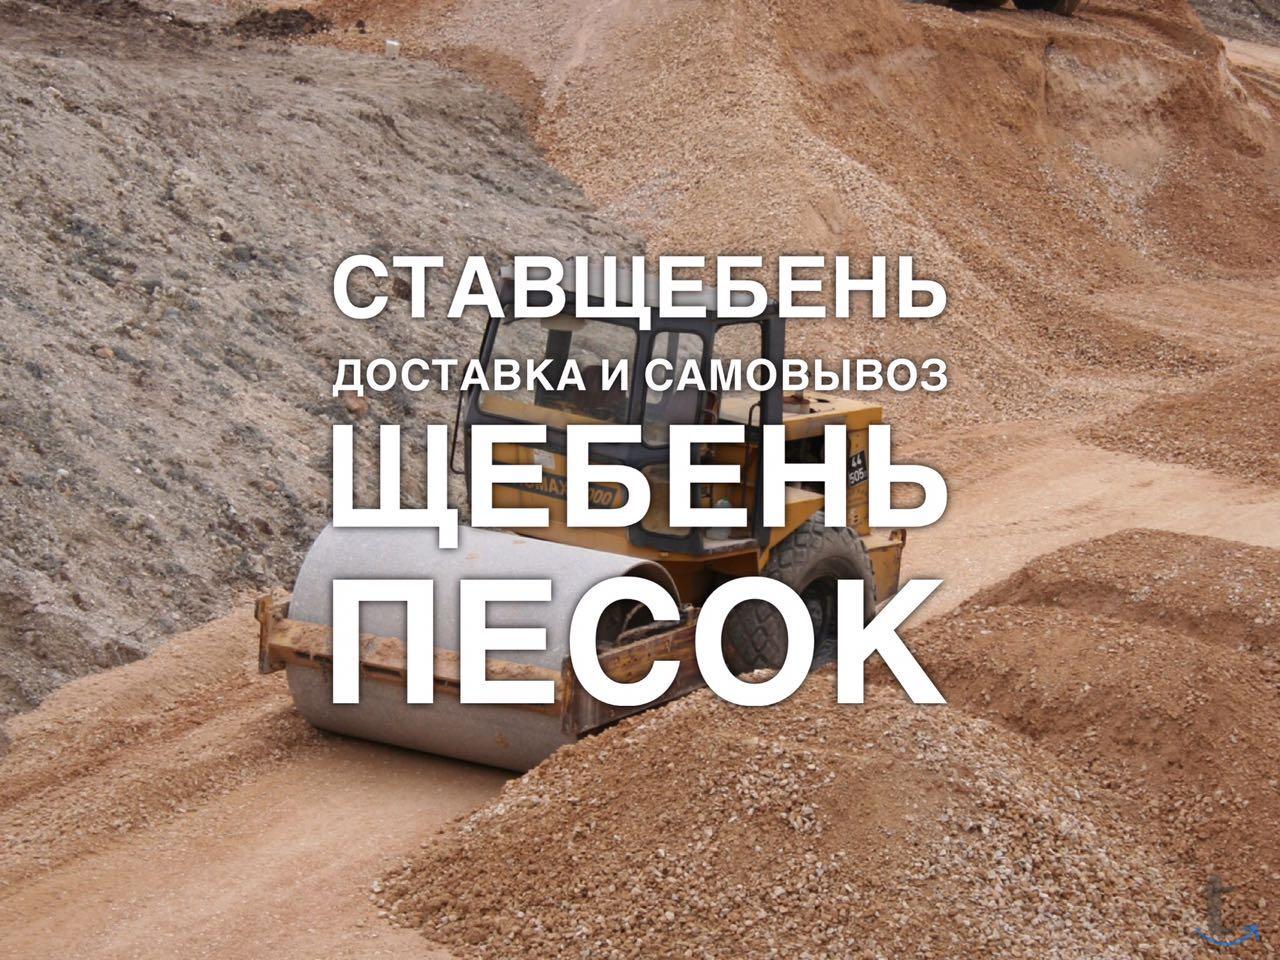 Продажа щебня в Ставрополе.